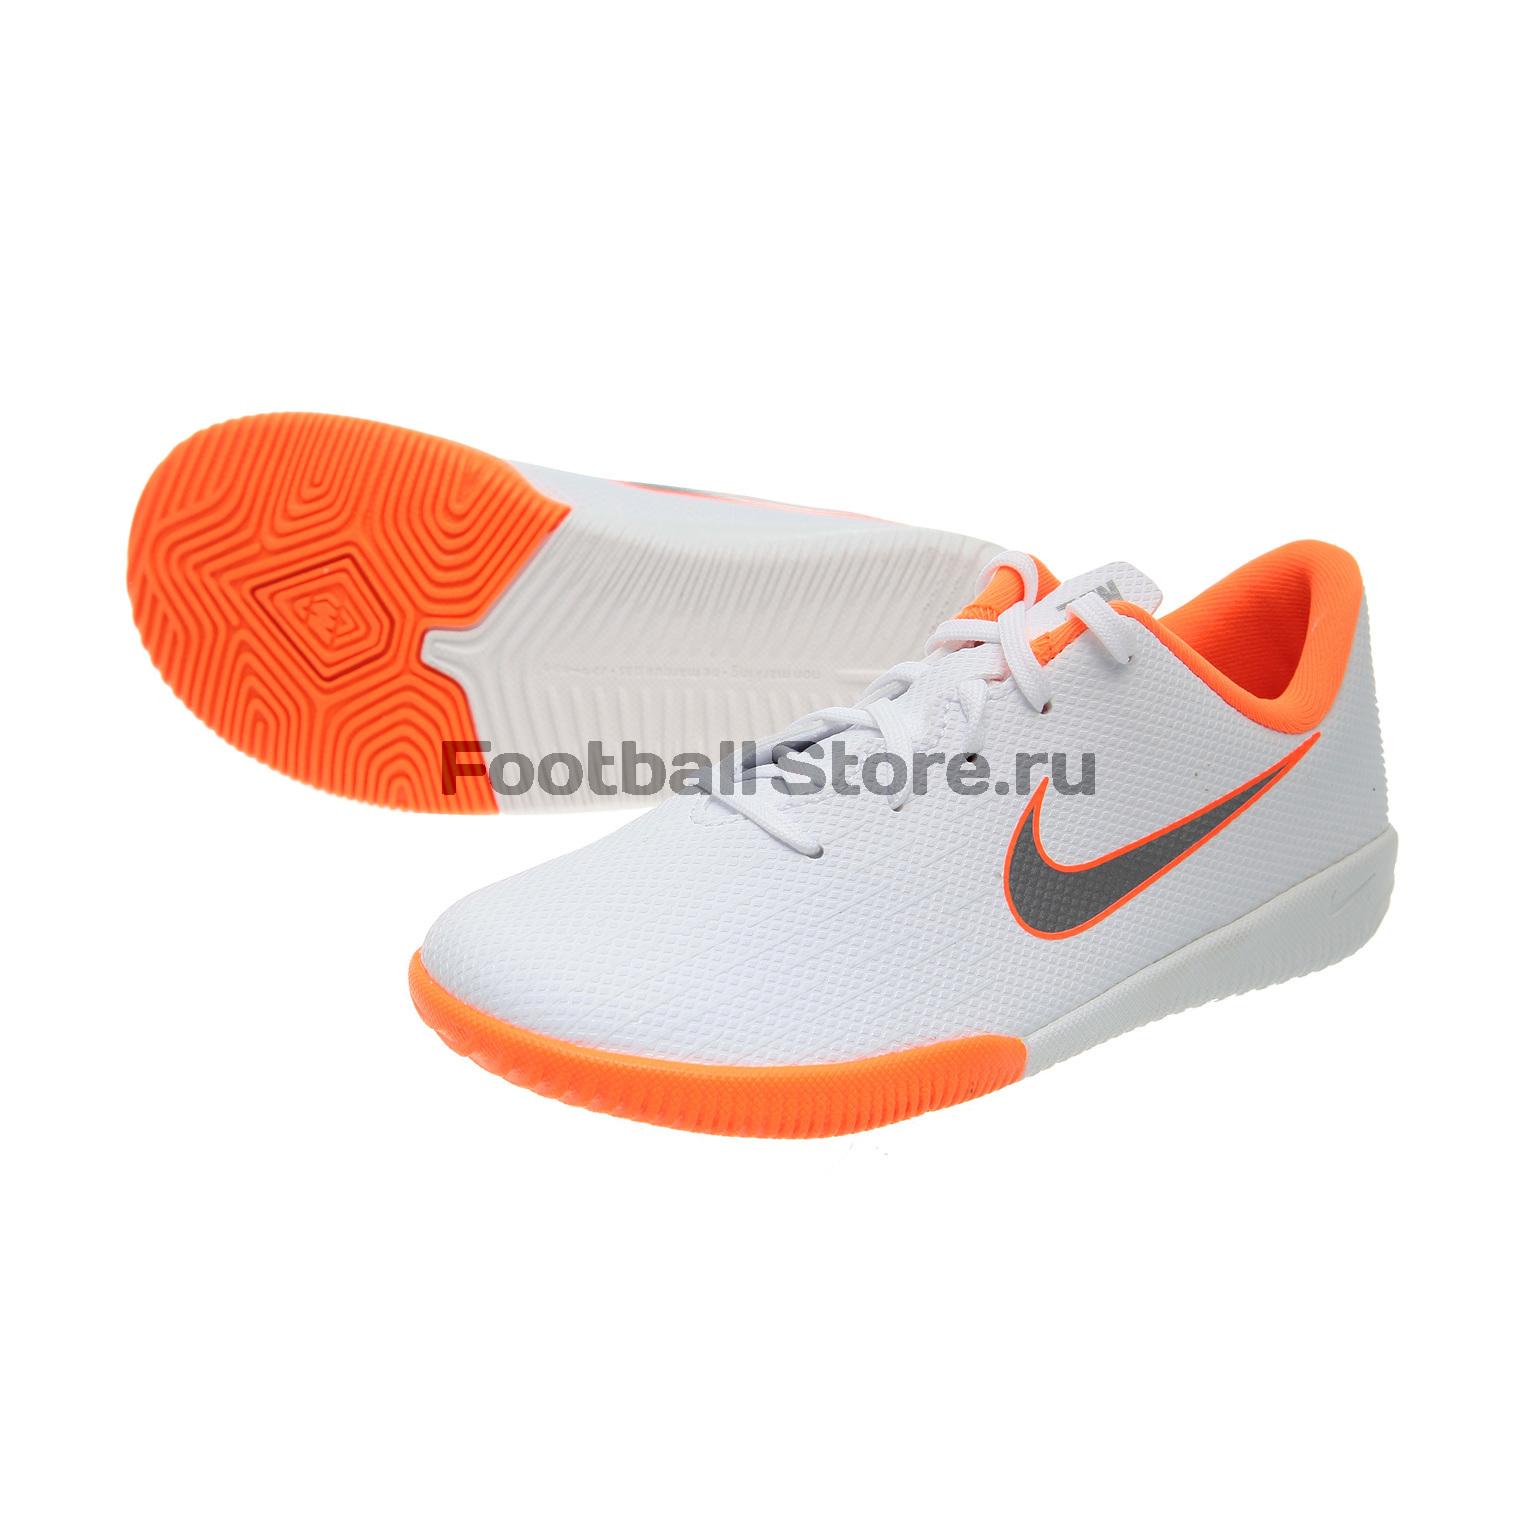 Обувь для зала Nike JR Vapor 12 Academy PS IC AH7352-107 бутсы nike jr vapor 12 academy ps fg mg ah7349 107